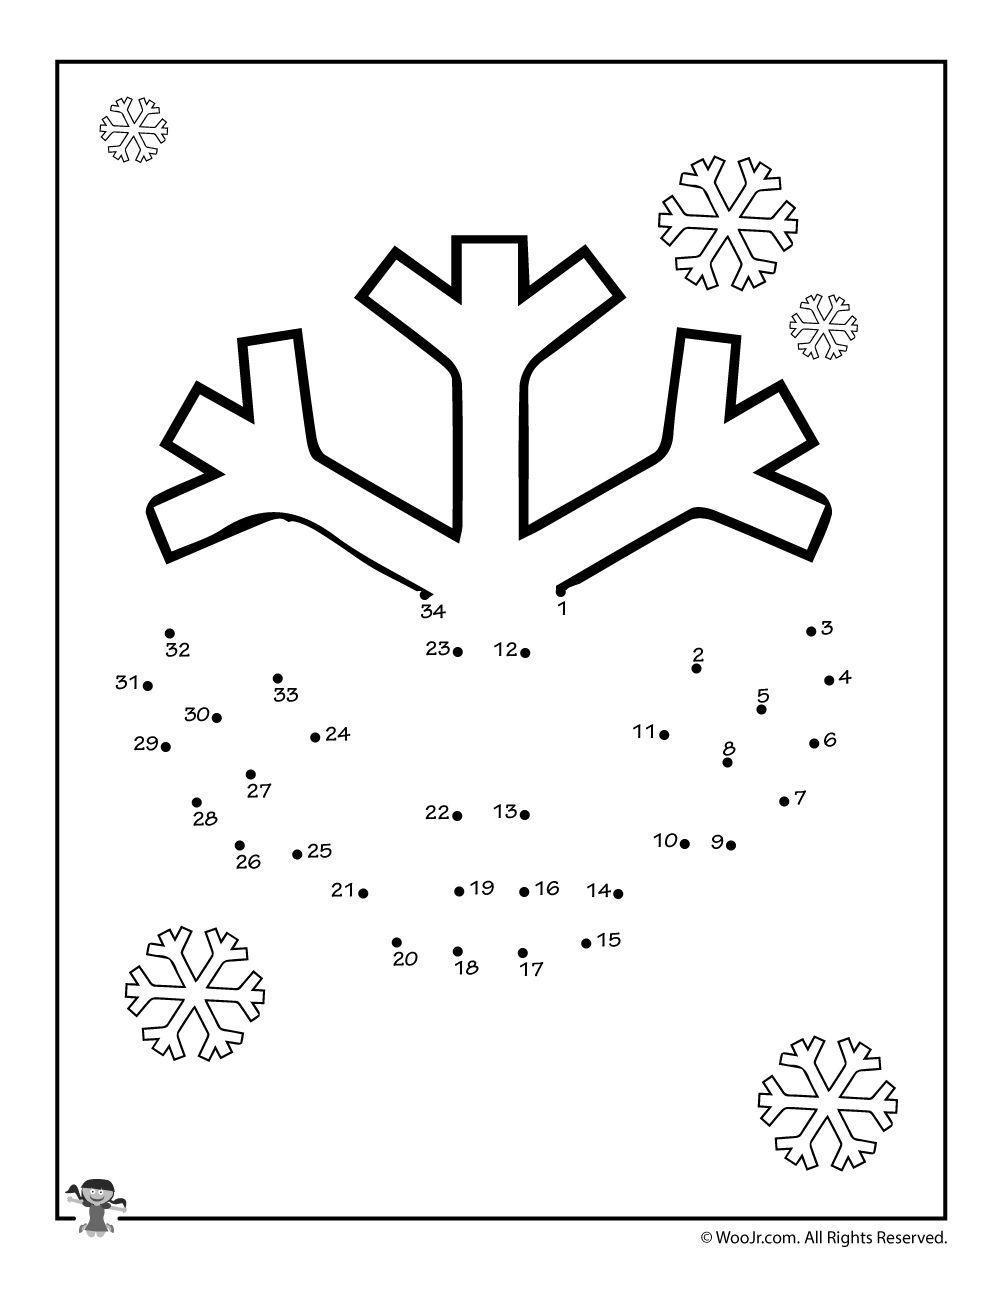 Snowflake Draw A Dot Activities Woo Jr Kids Activities Kindergarten Worksheets Snowflakes Drawing Kindergarten Worksheets Printable [ 1294 x 1000 Pixel ]